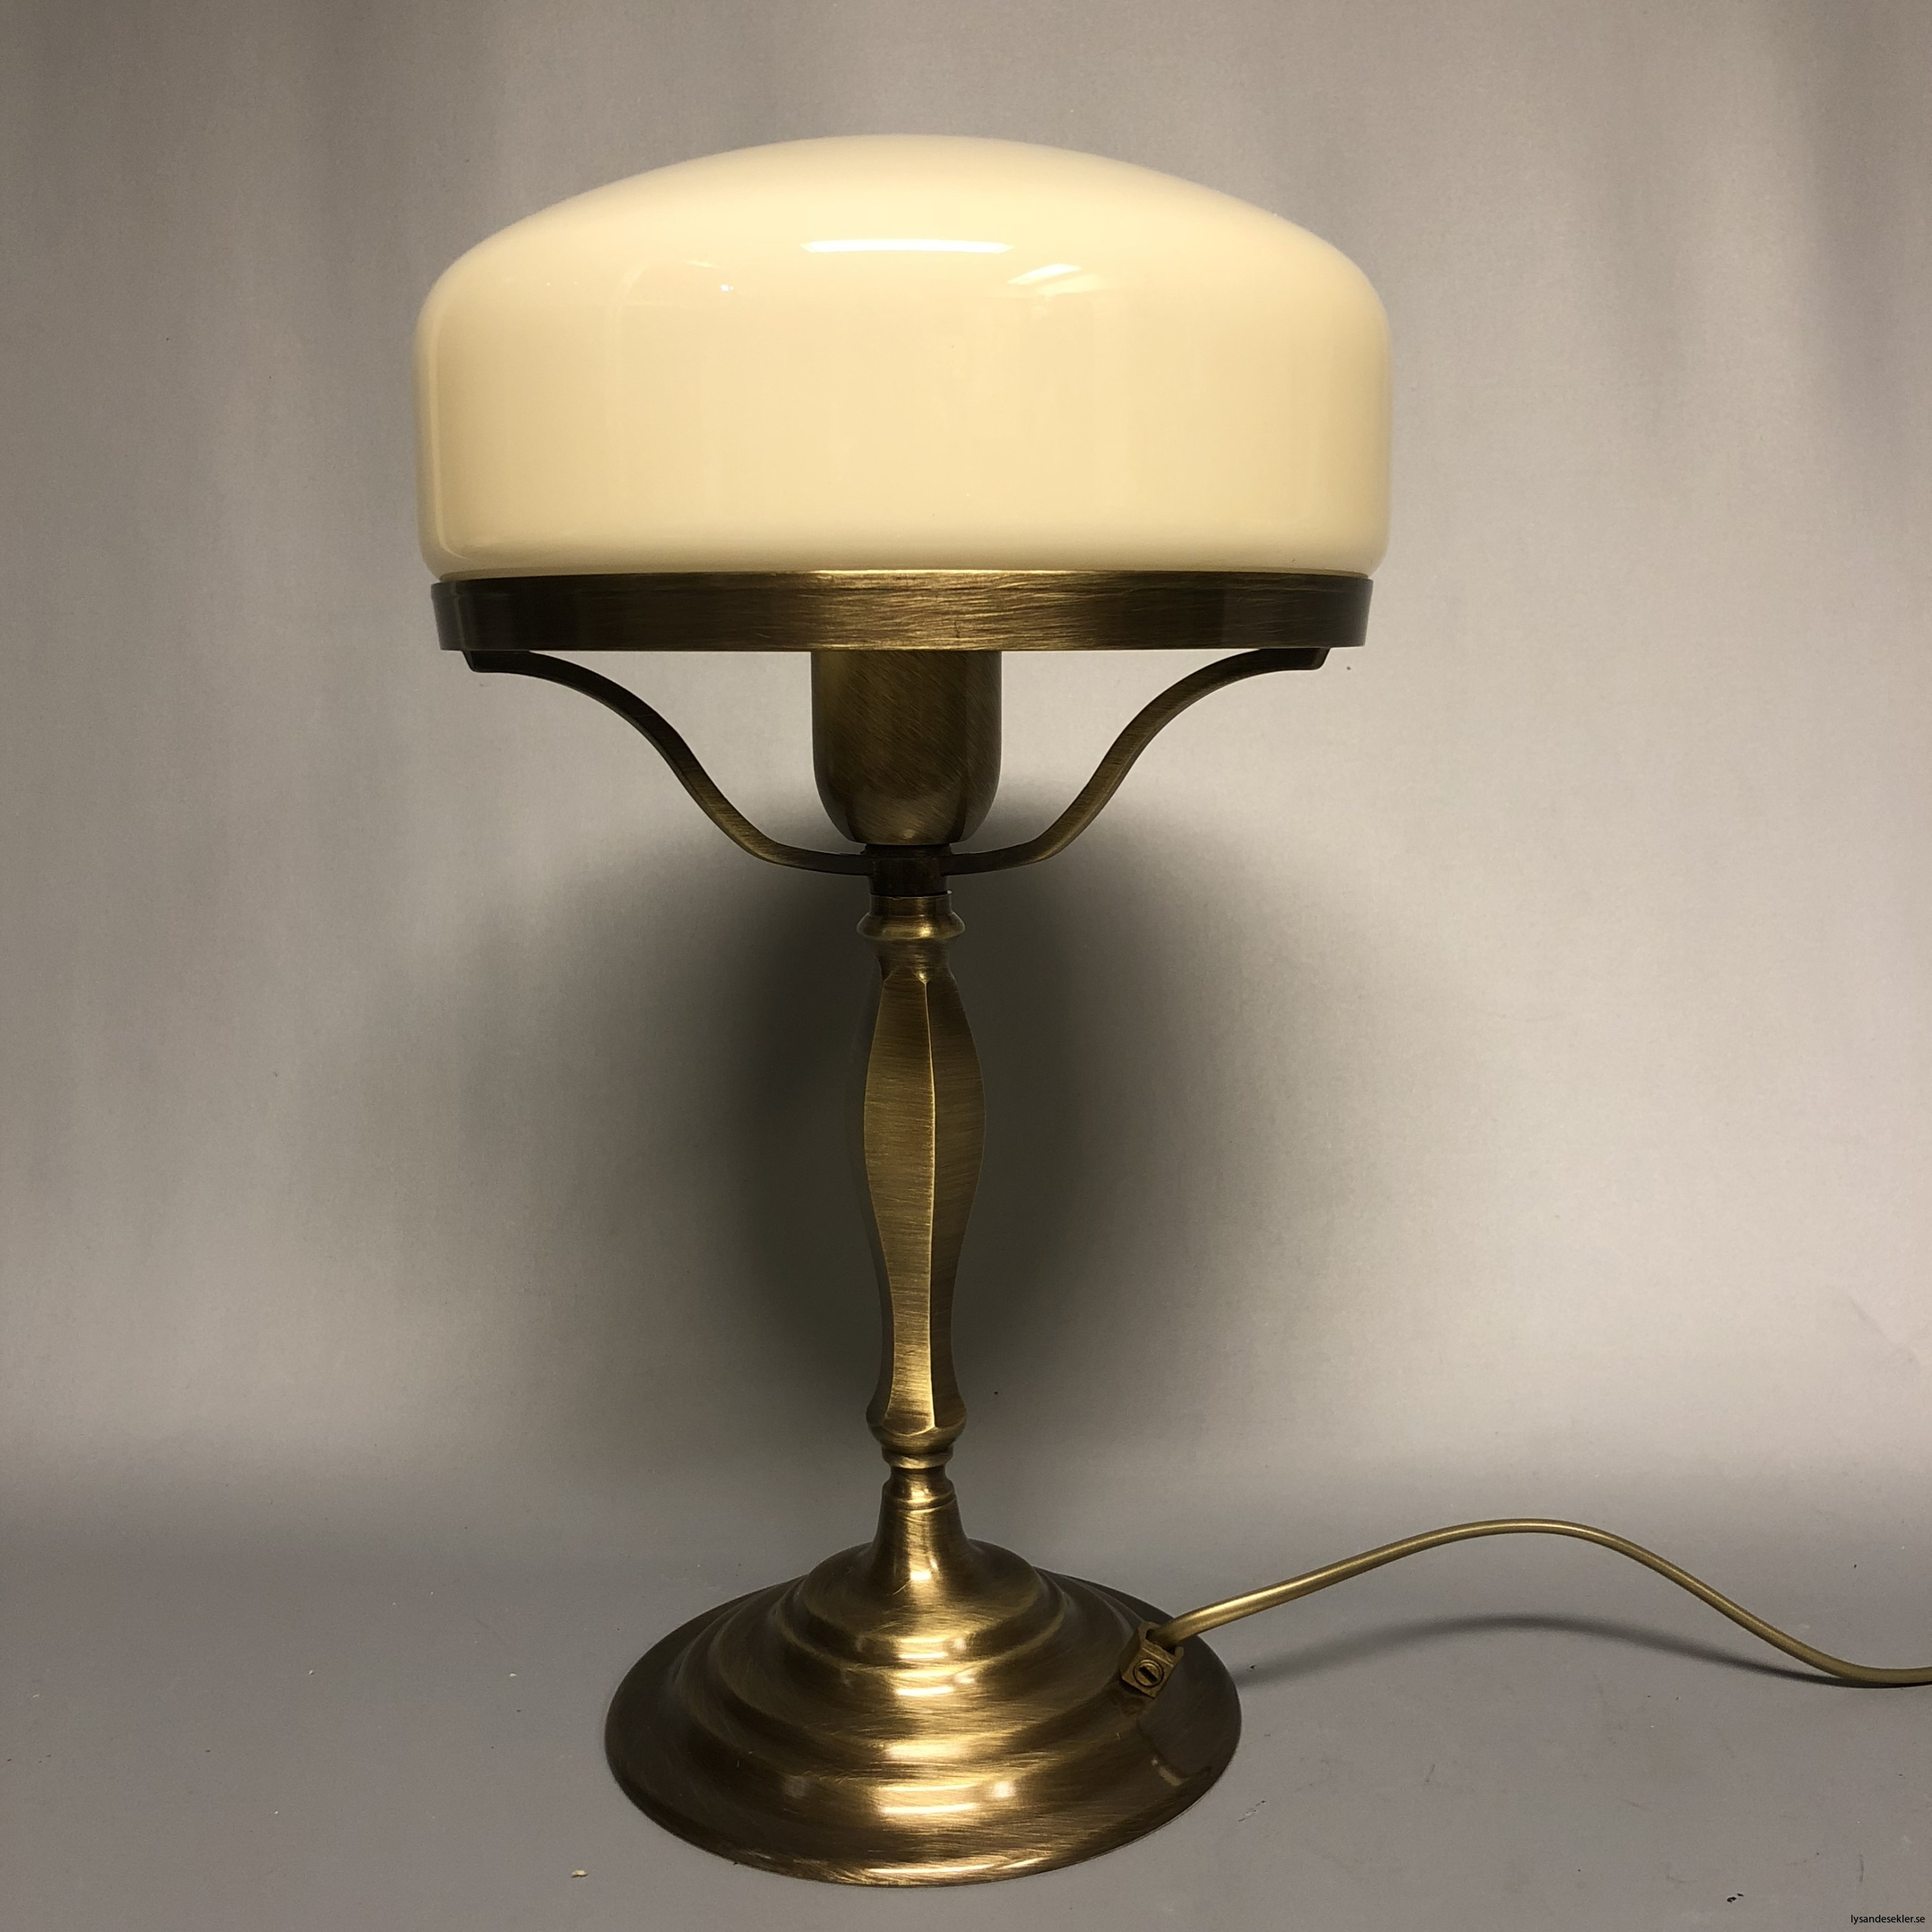 strindbergslampa strindbergslampor strindberg lampa skärm kupa strindbergsskärm strindbergskupa41